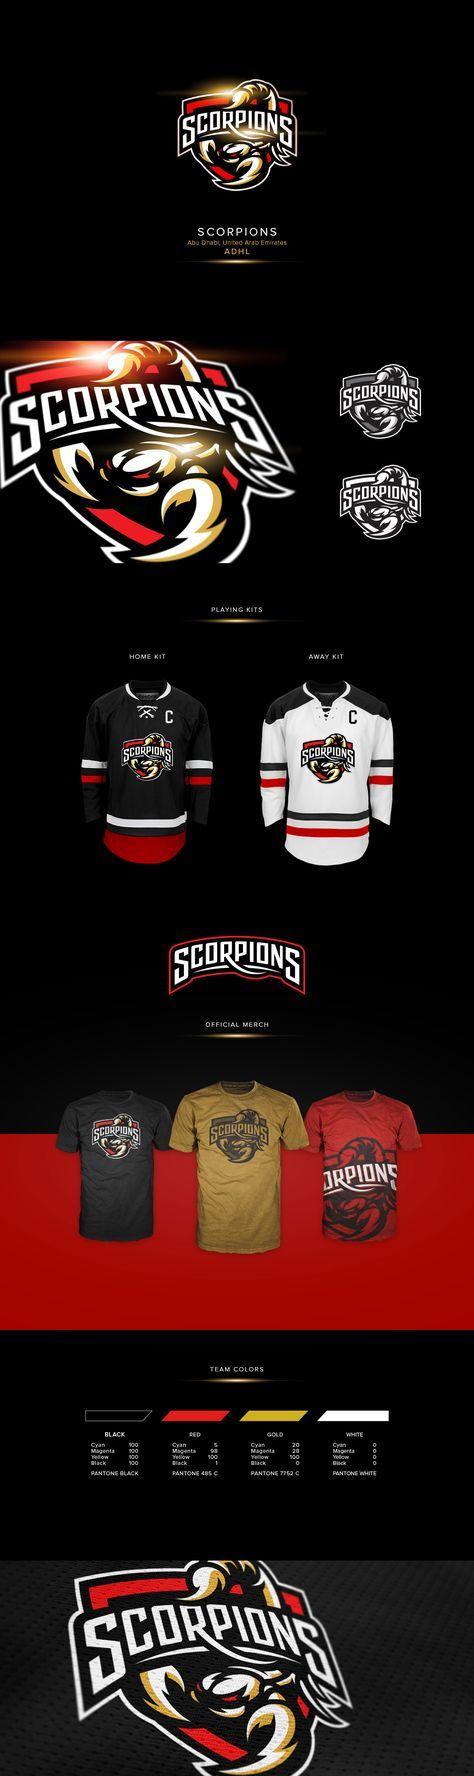 "Logo for ""Abu Dhabi Scorpions"" - hockey team based in Abu Dhabi, UAE"